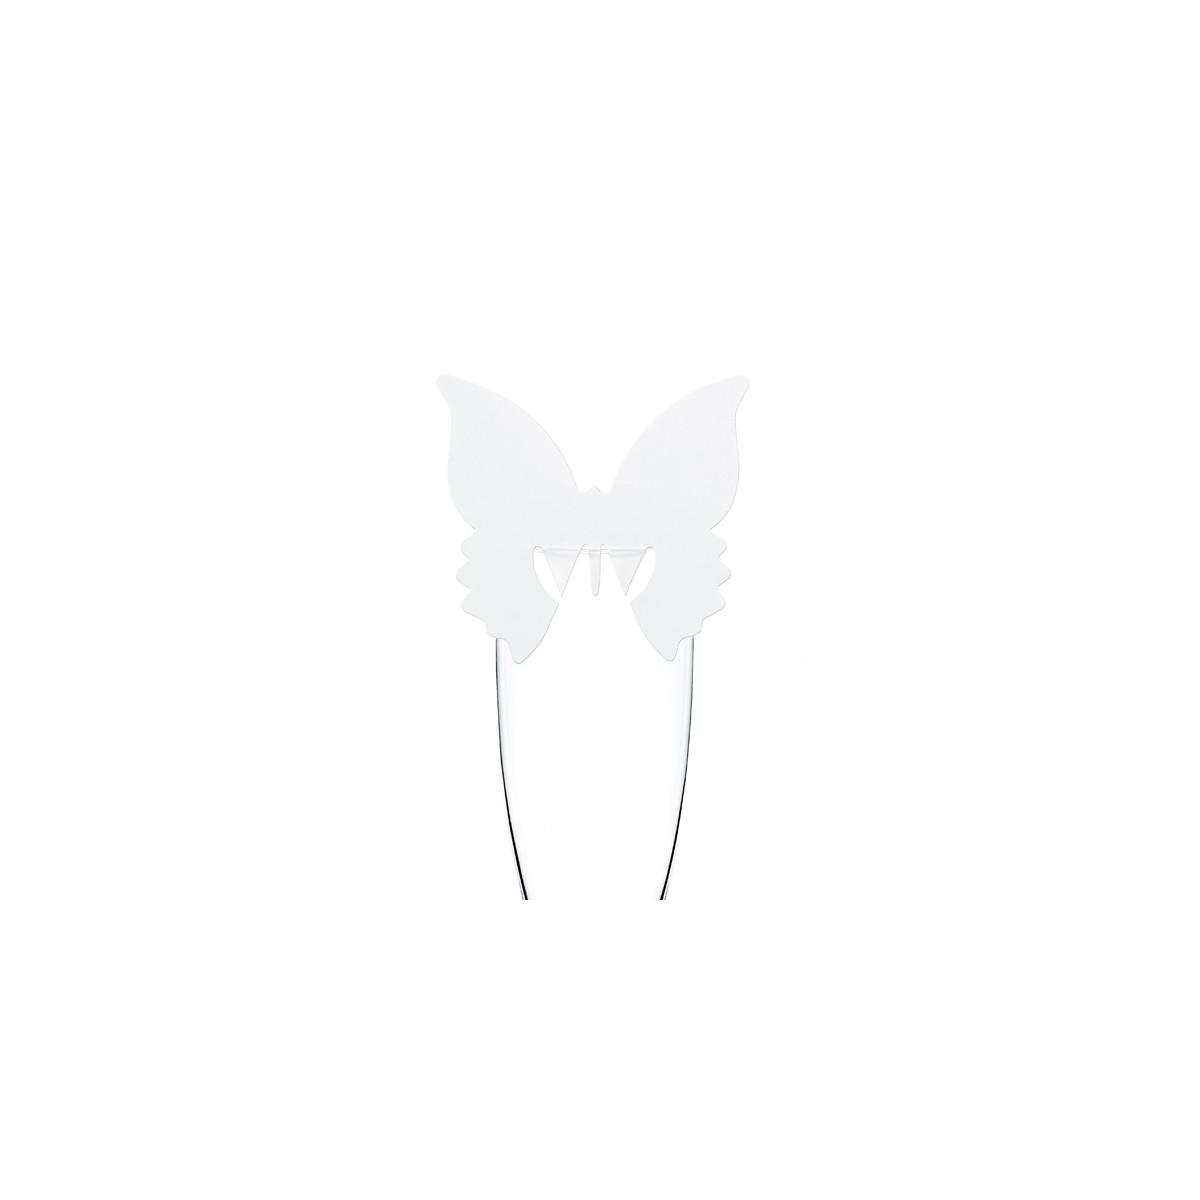 Marque verre papillon dentelé